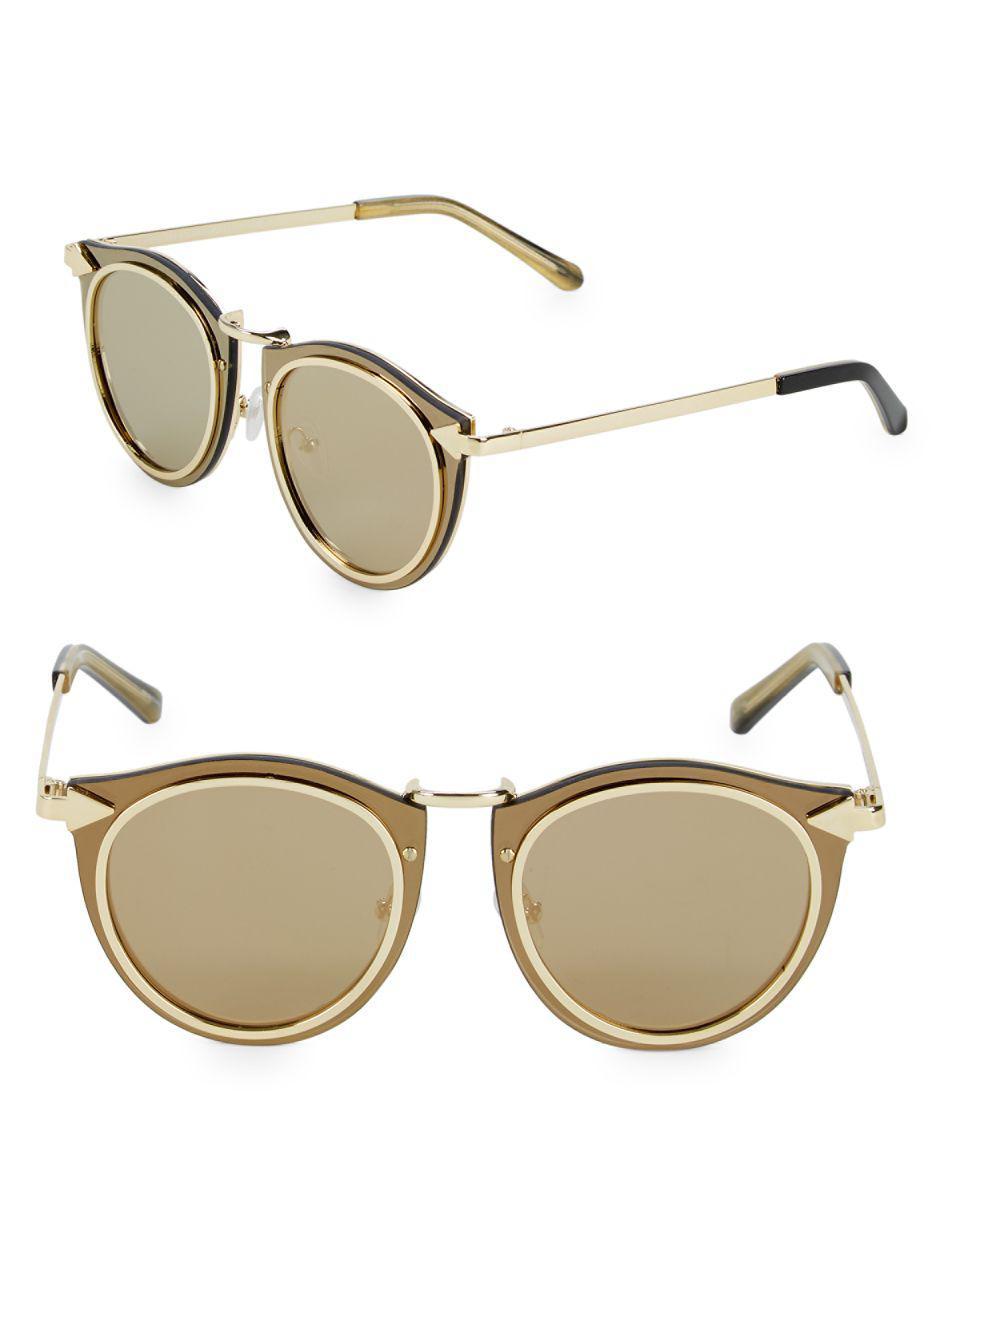 3d261275204 Lyst - Karen Walker Superstars Sola 63mm Round Sunglasses in Metallic